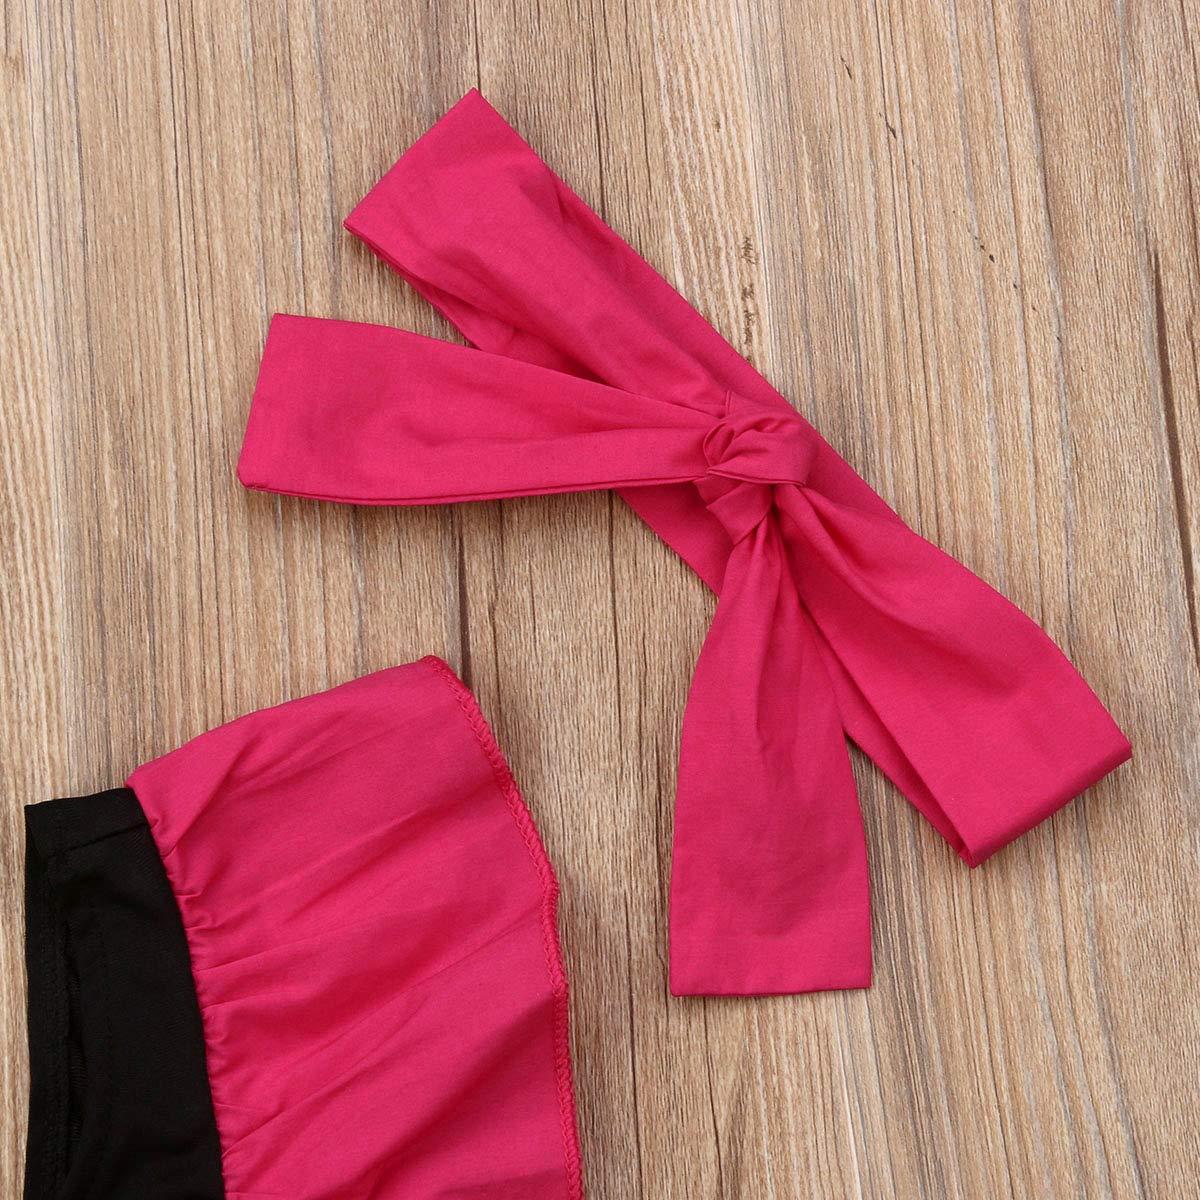 Headband 2Pcs Set Outfit Infant Baby Girl Ruffle Swimsuit Swimwear One-Piece Bathing Suit Romper